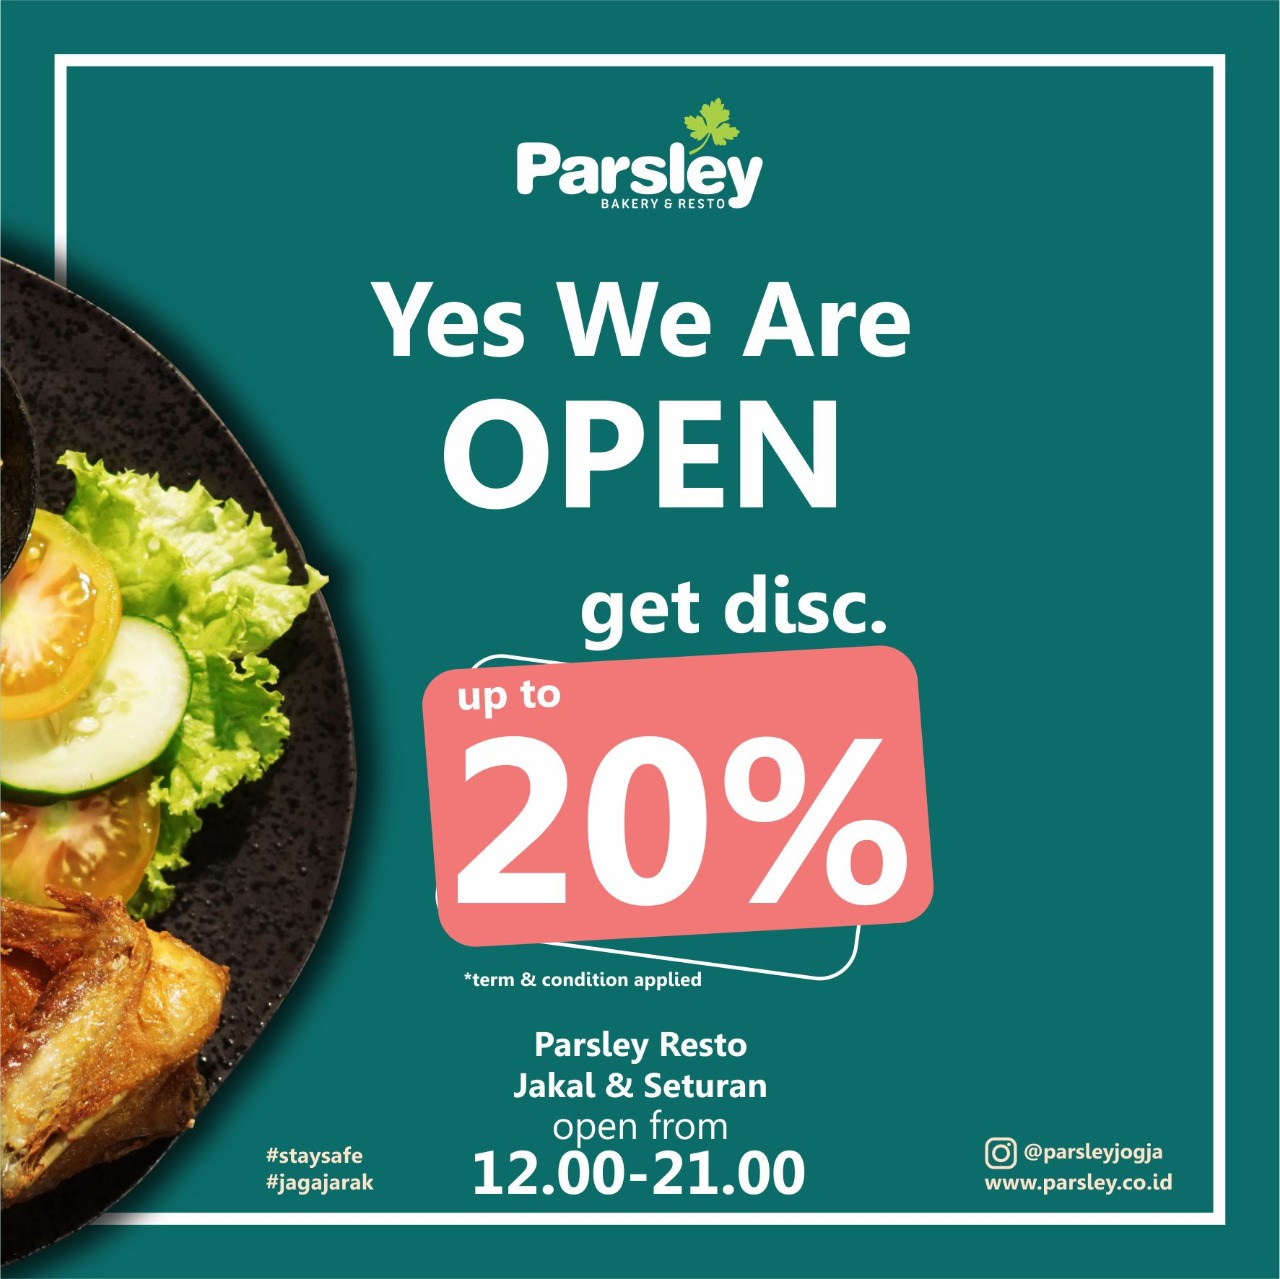 Special Discount 20% at Parsley Resto Jakal & Seturan